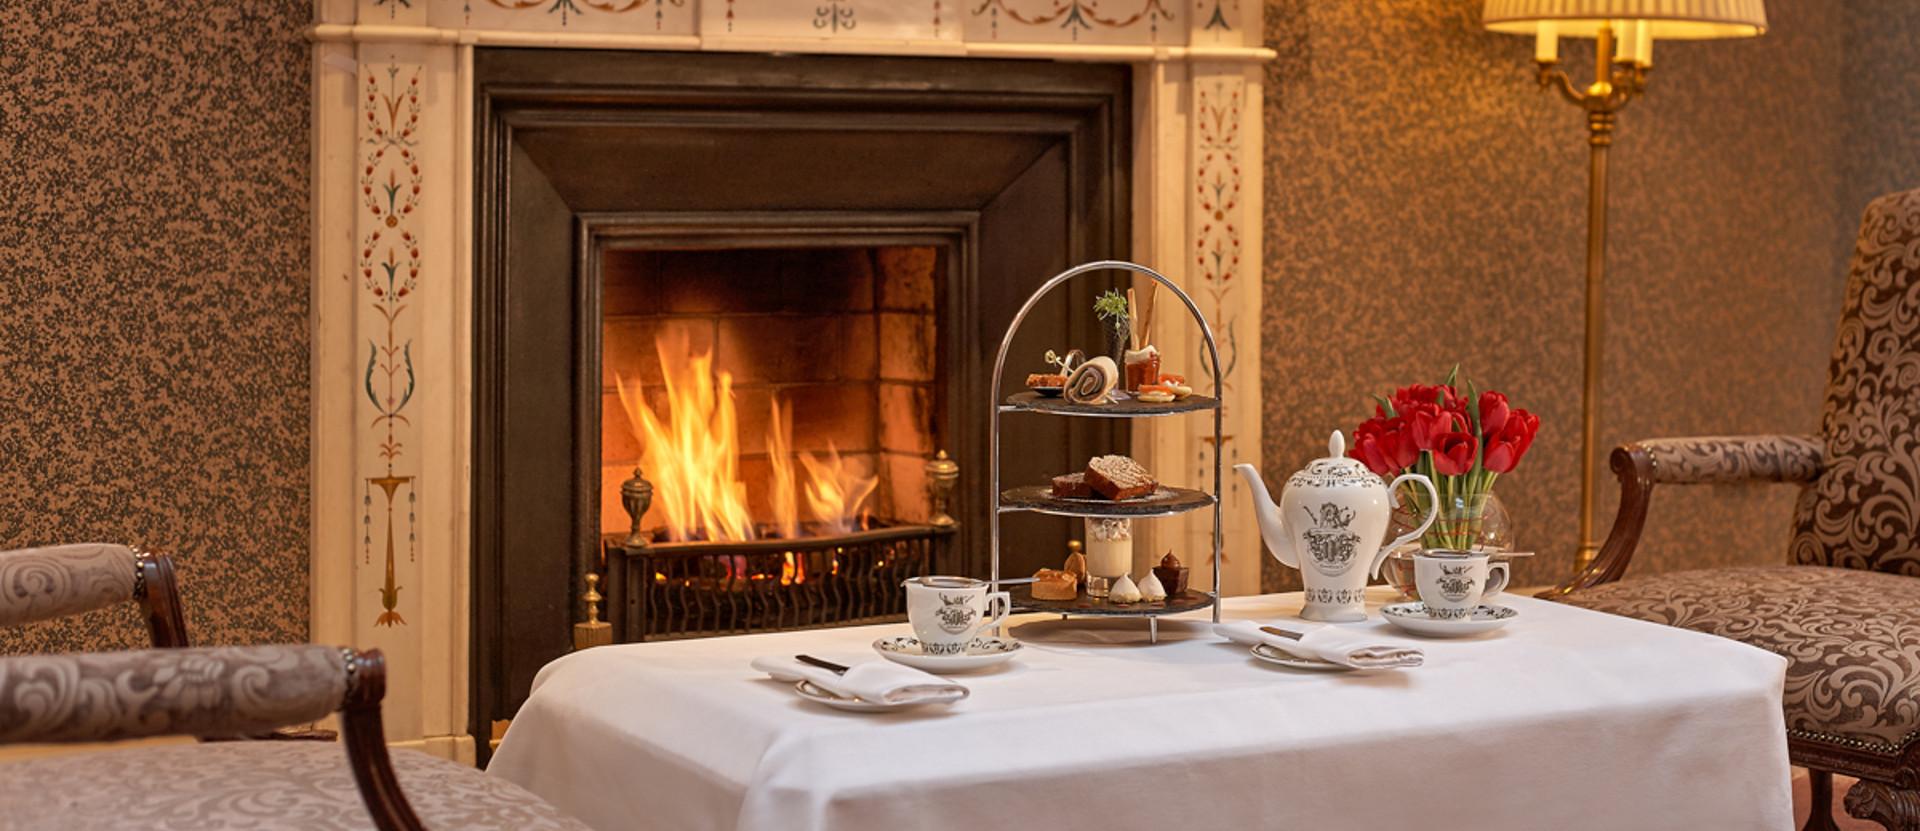 The Atrium Lounge Fireplace - Afternoon Tea